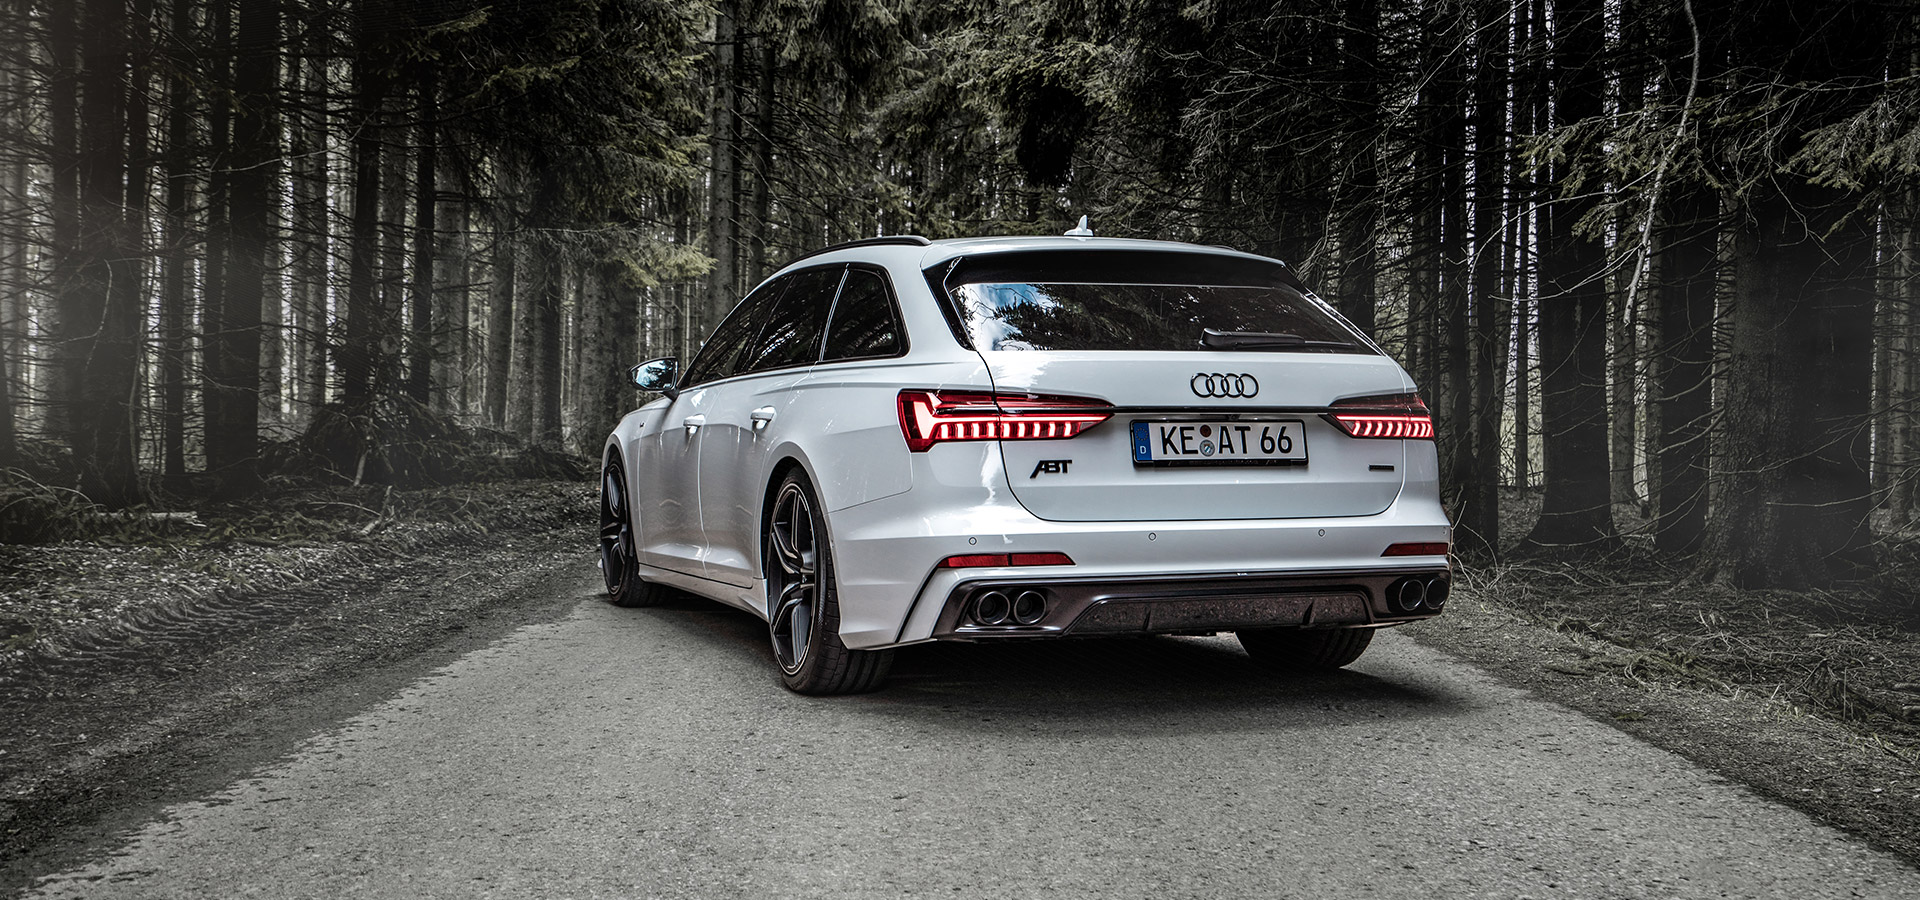 Audi A6 Abt Sportsline